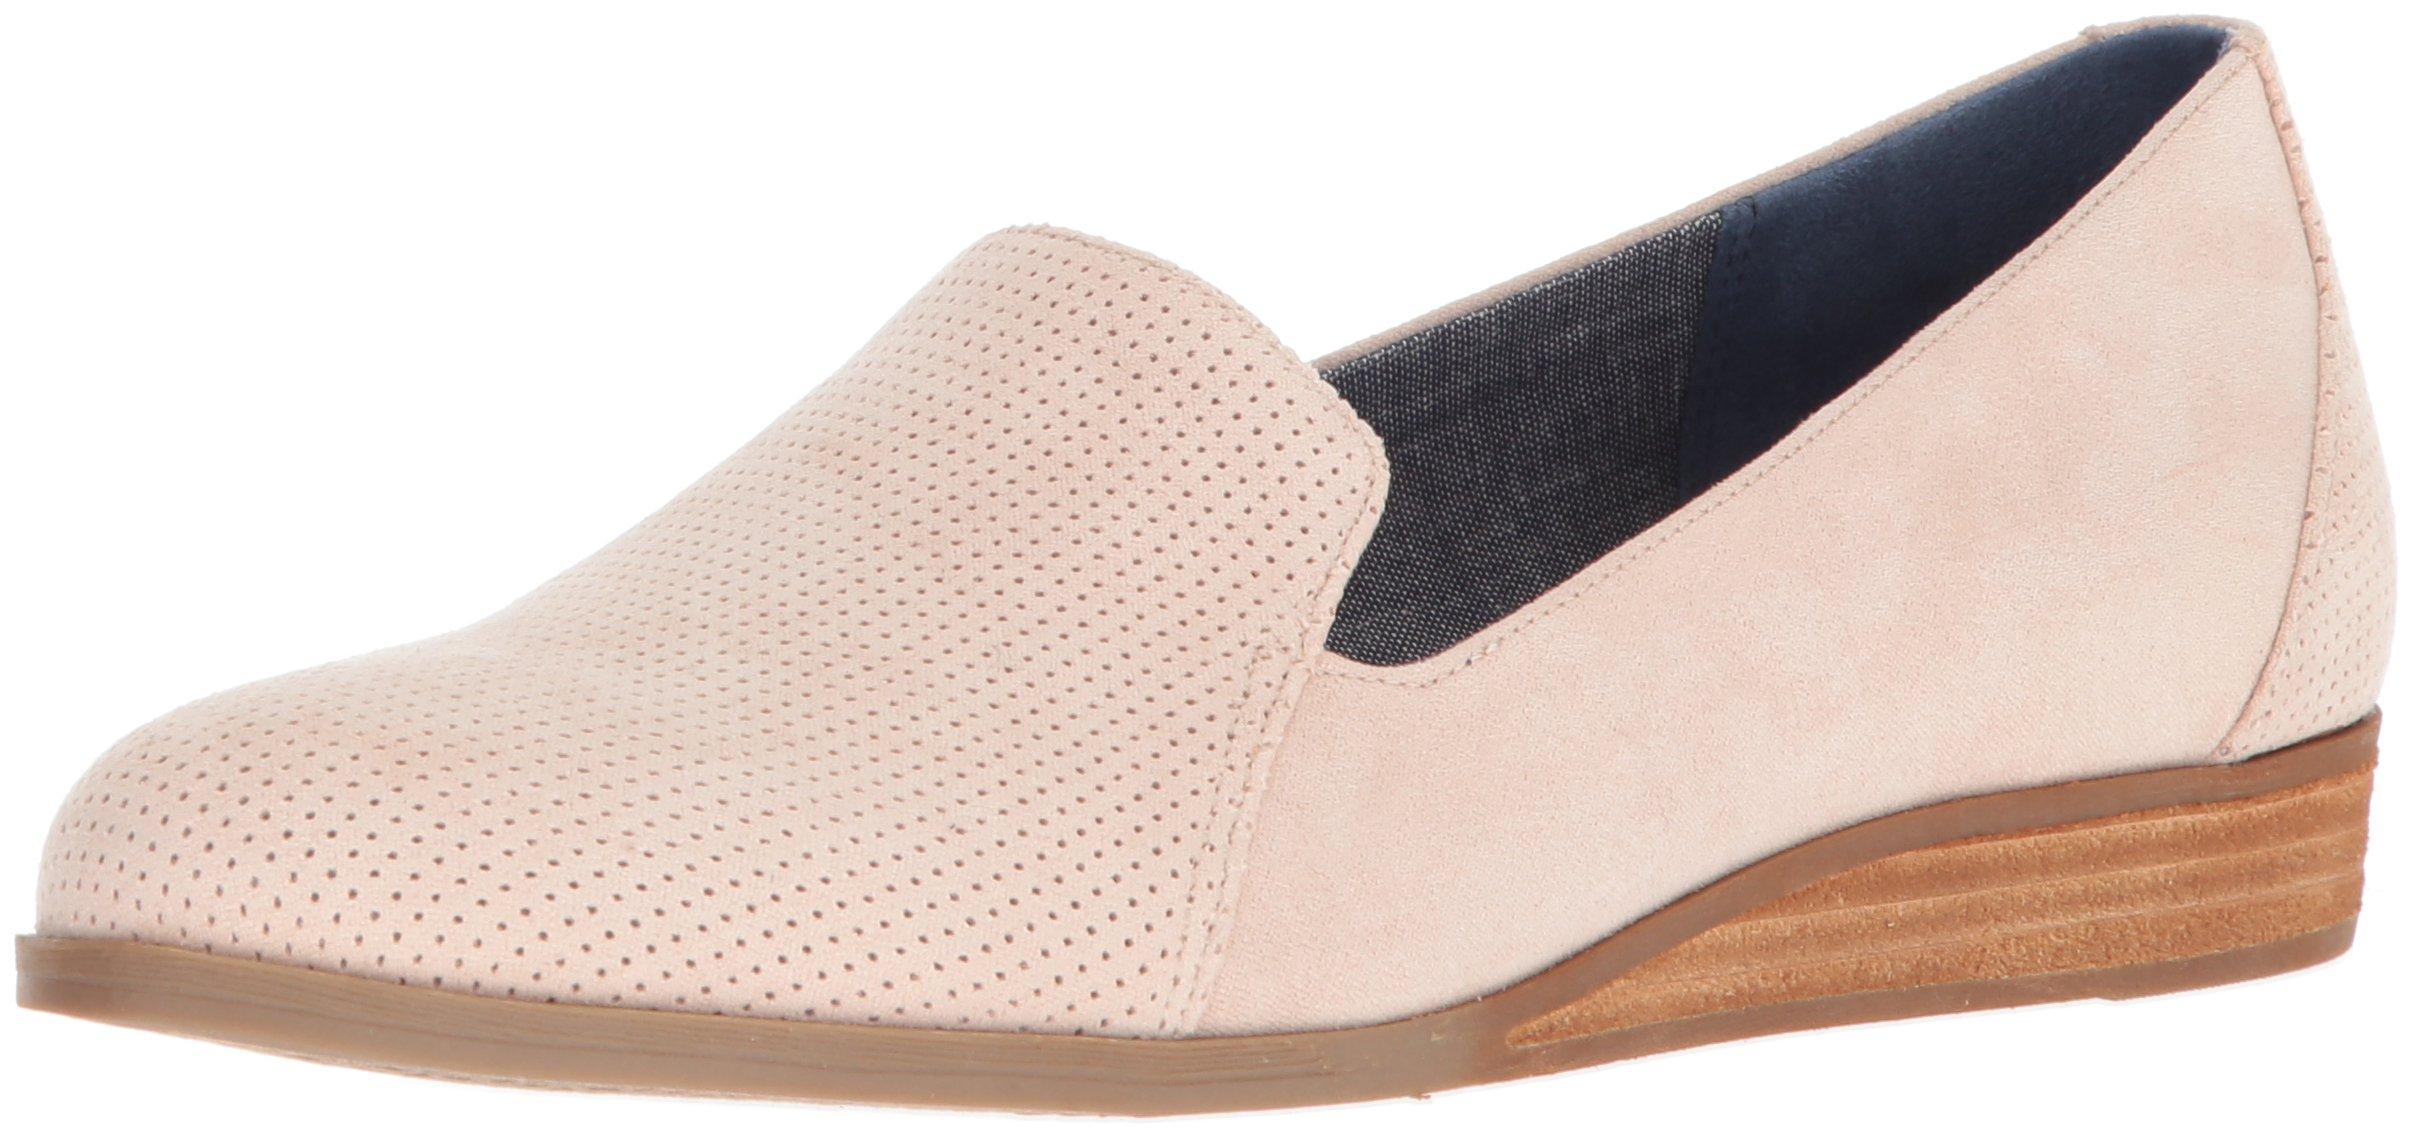 Dr. Scholl's Shoes Women's Dawned Loafer, Blush Microfiber, 8.5 M US